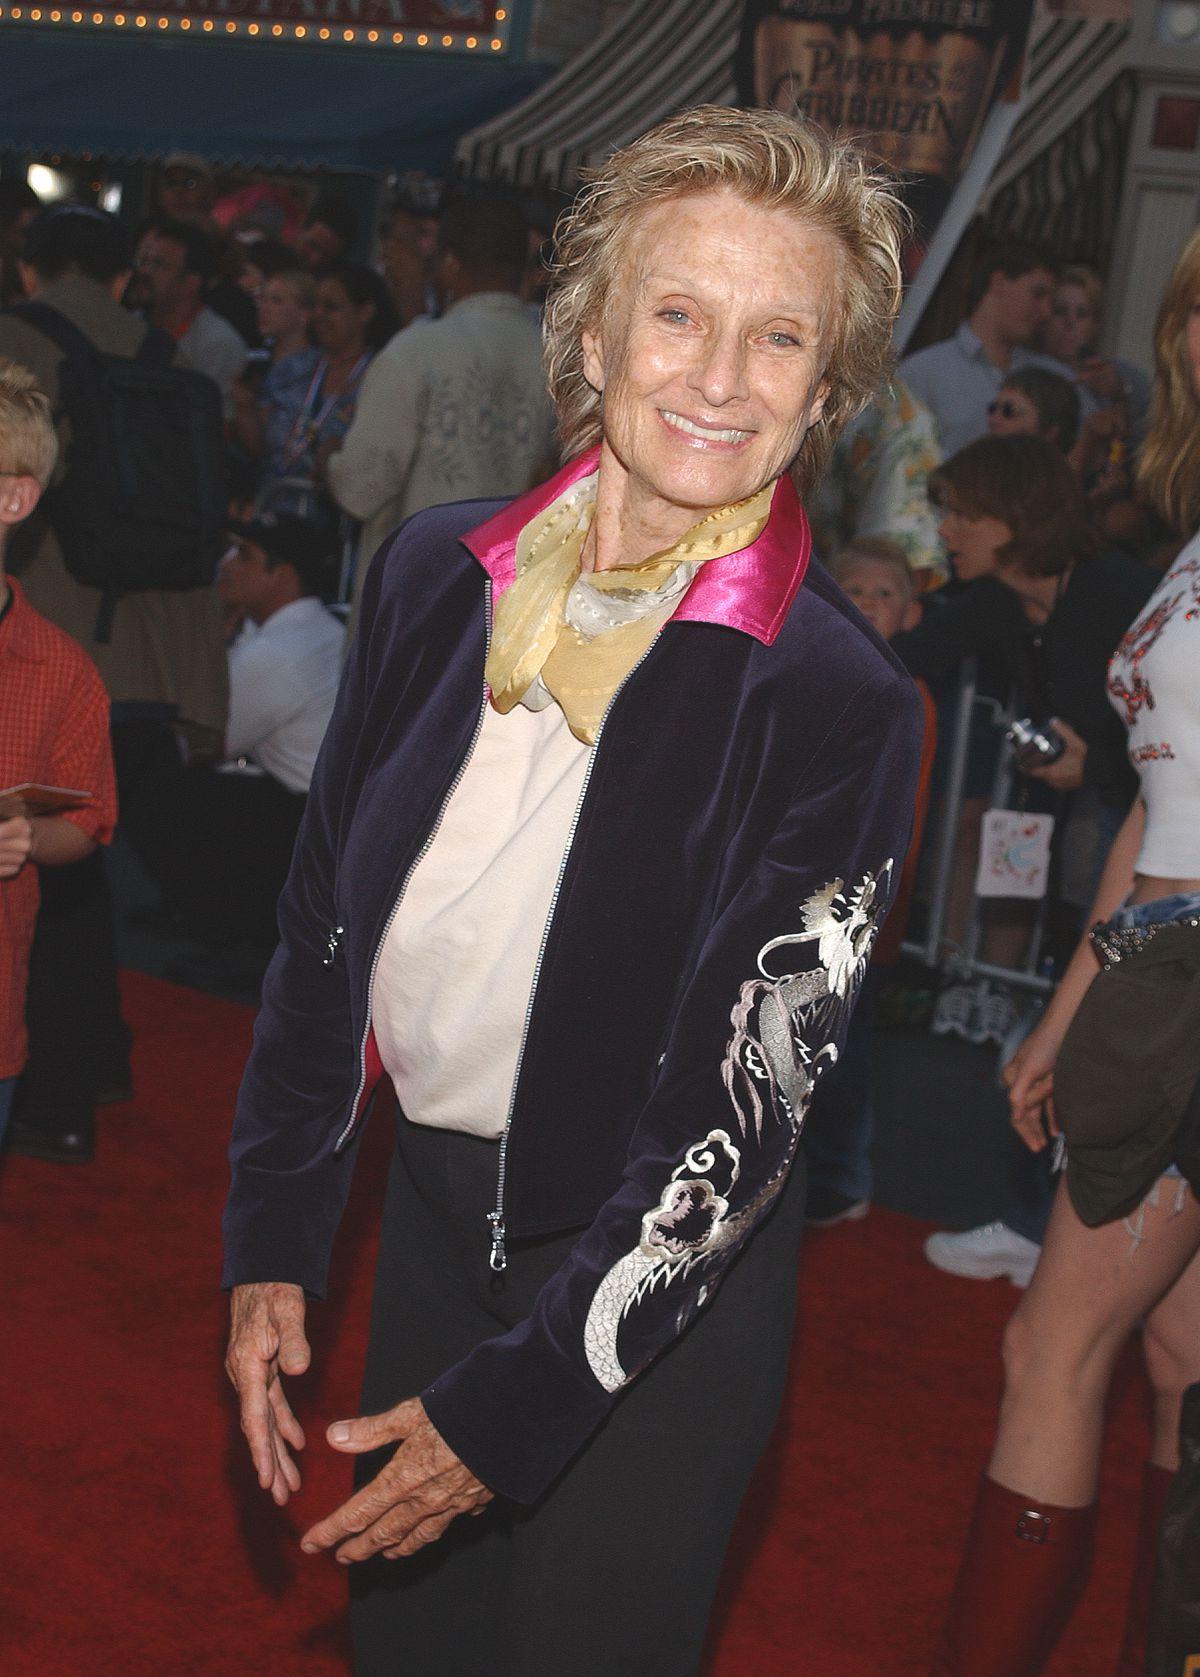 Cloris Leachman at the Pirates premiere